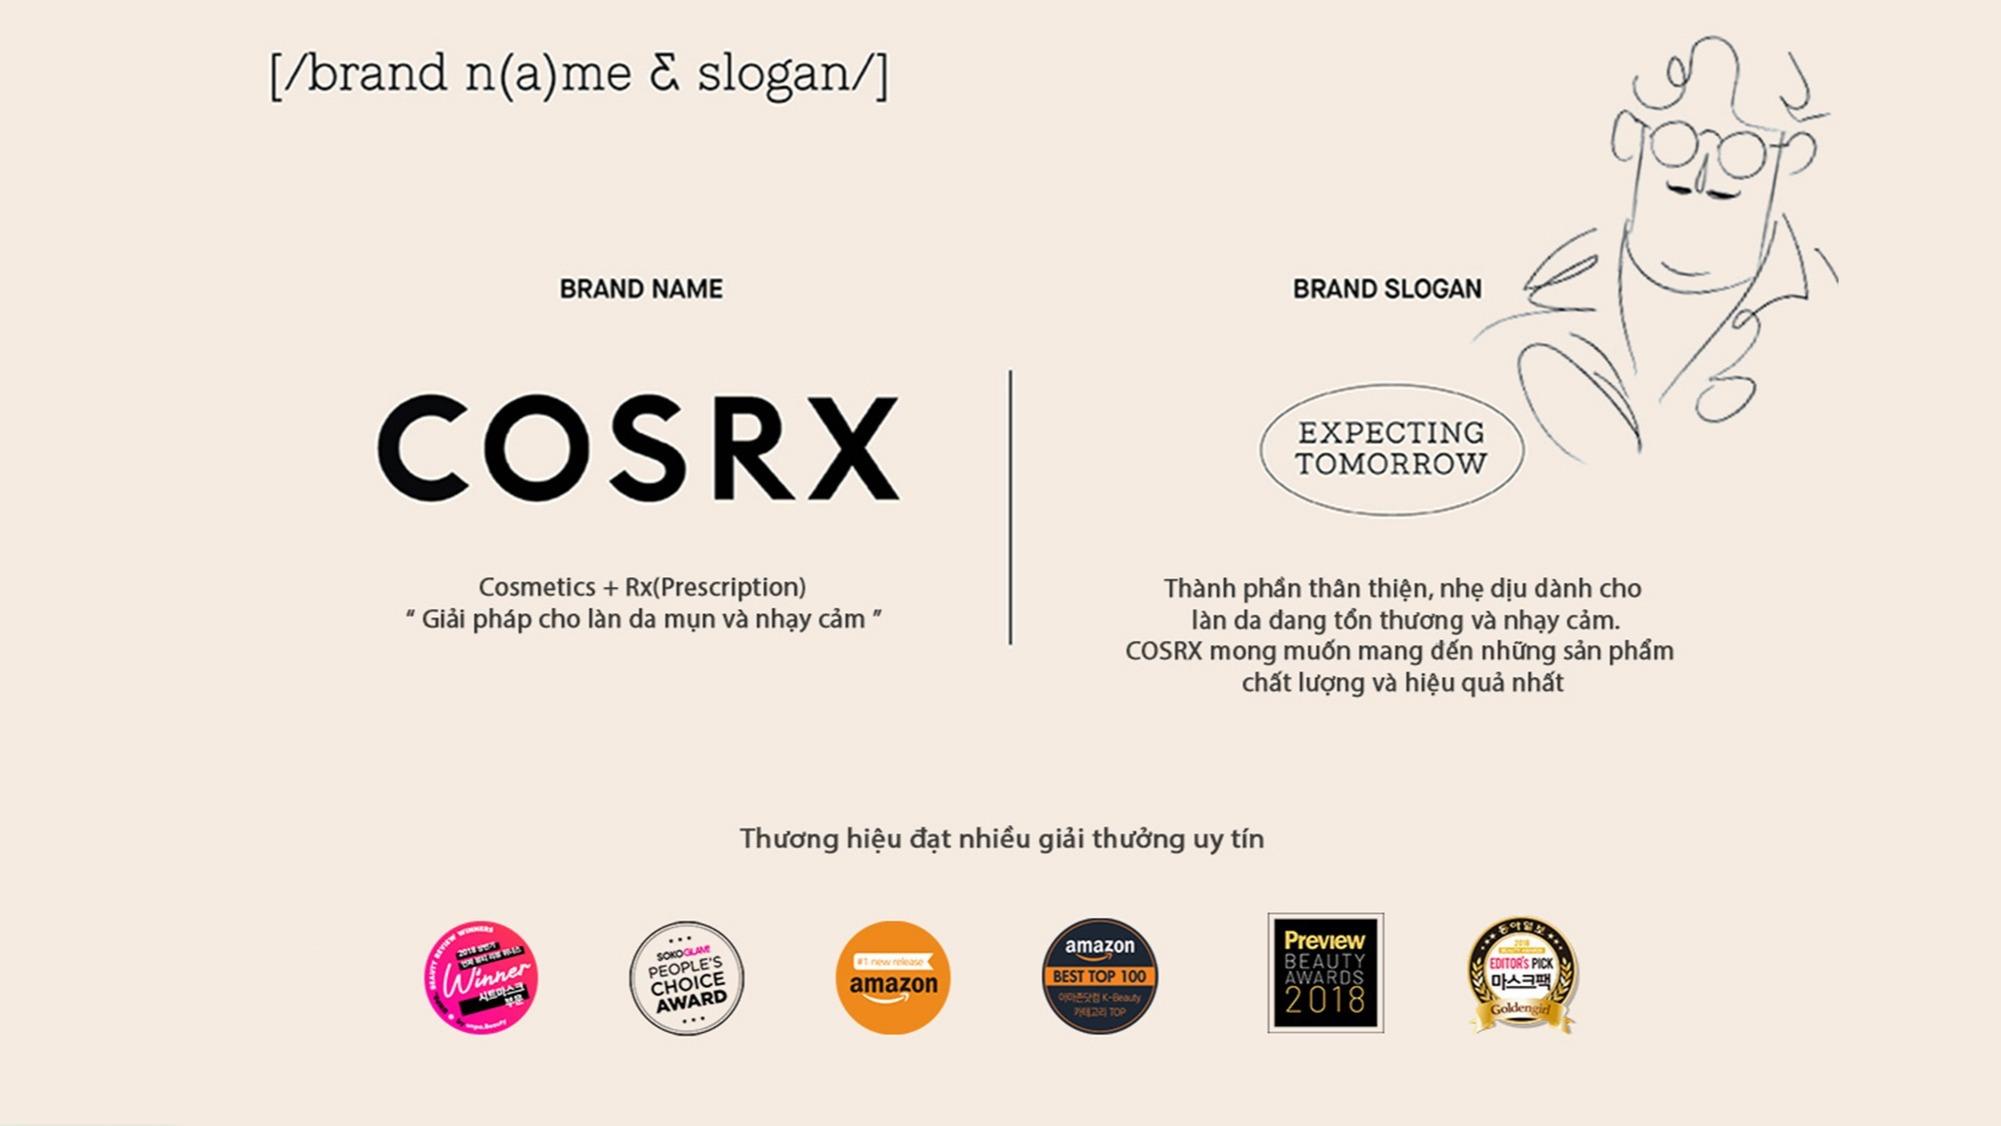 COSRX brand & slogan